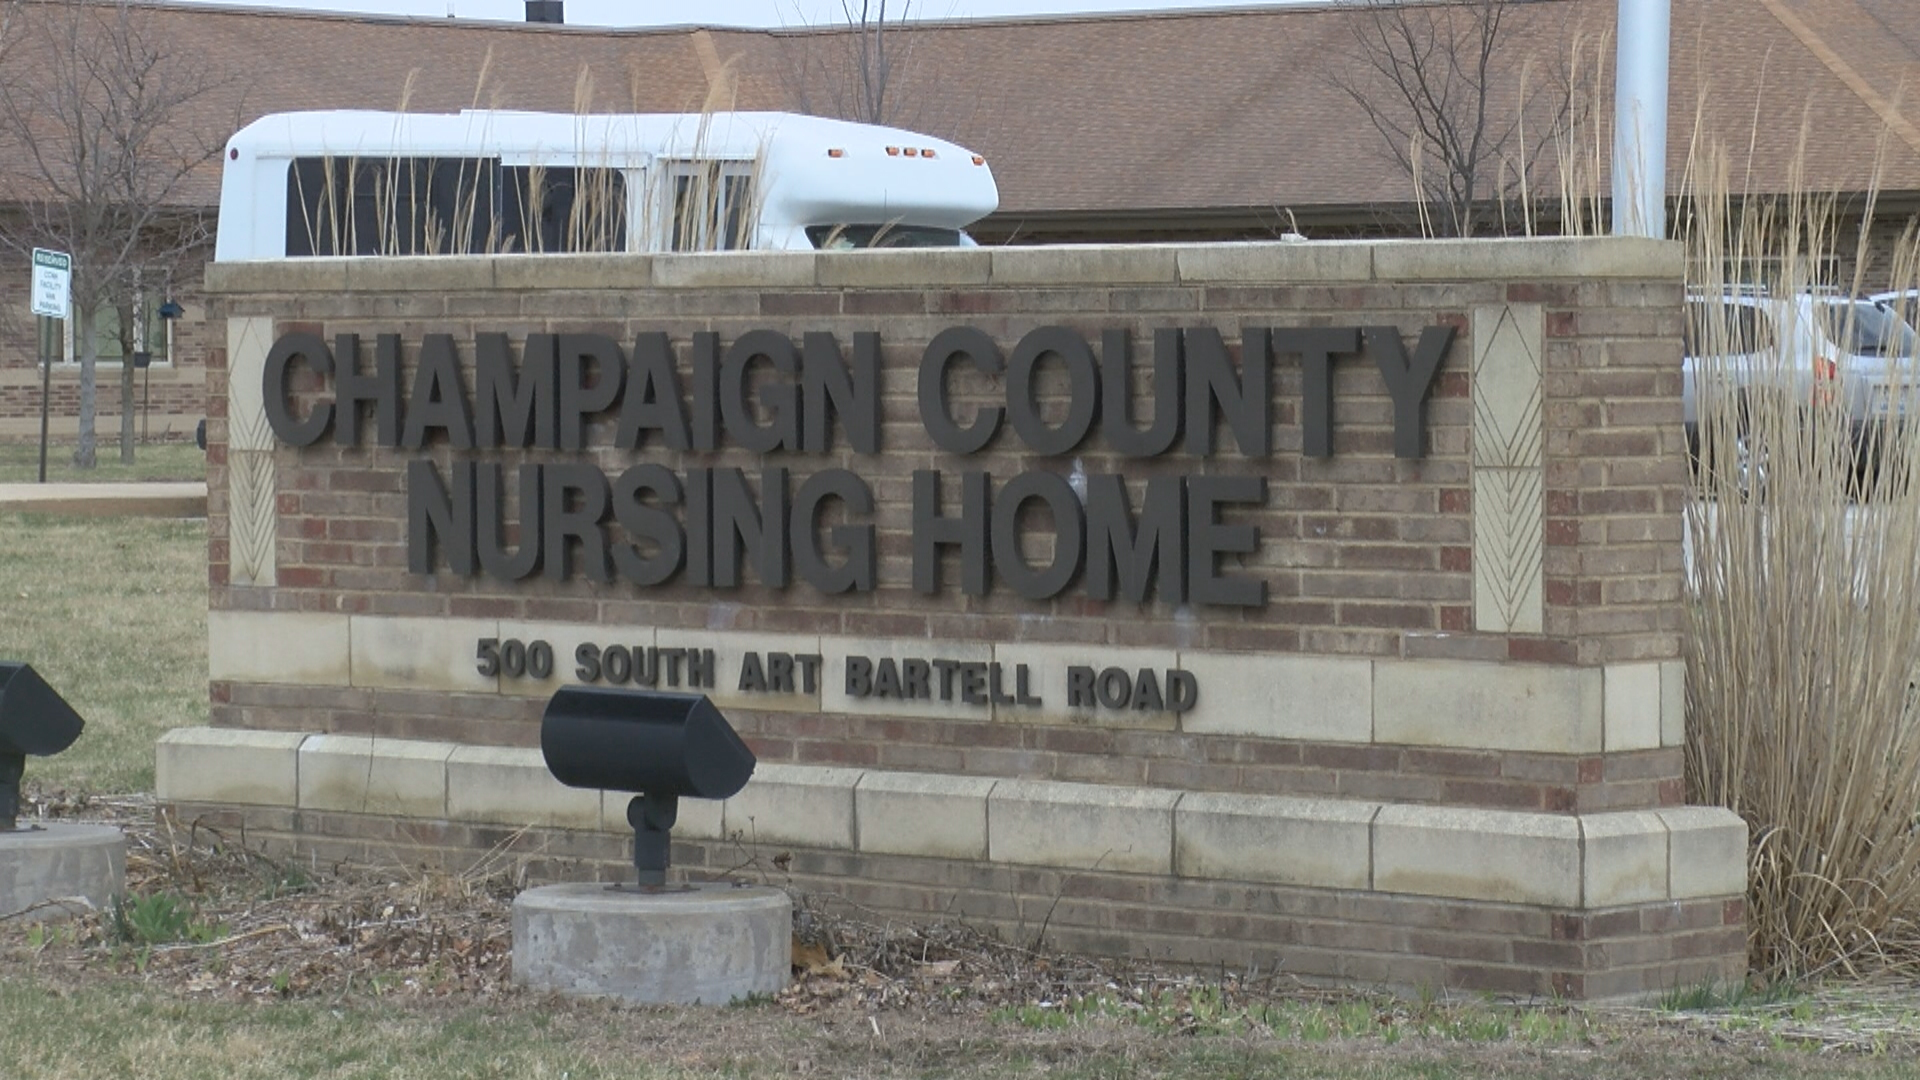 champaign county nursing home (6)_1554931628014.jpg.jpg